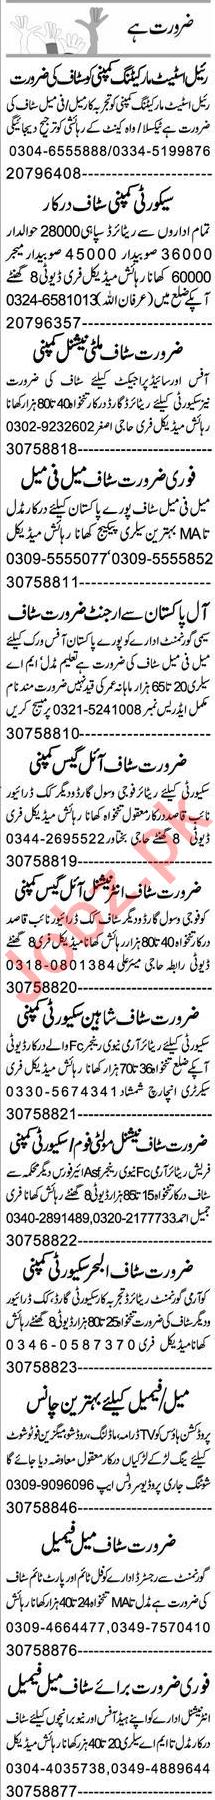 Data Entry Operator & Call Operator Jobs 2021 in Peshawar